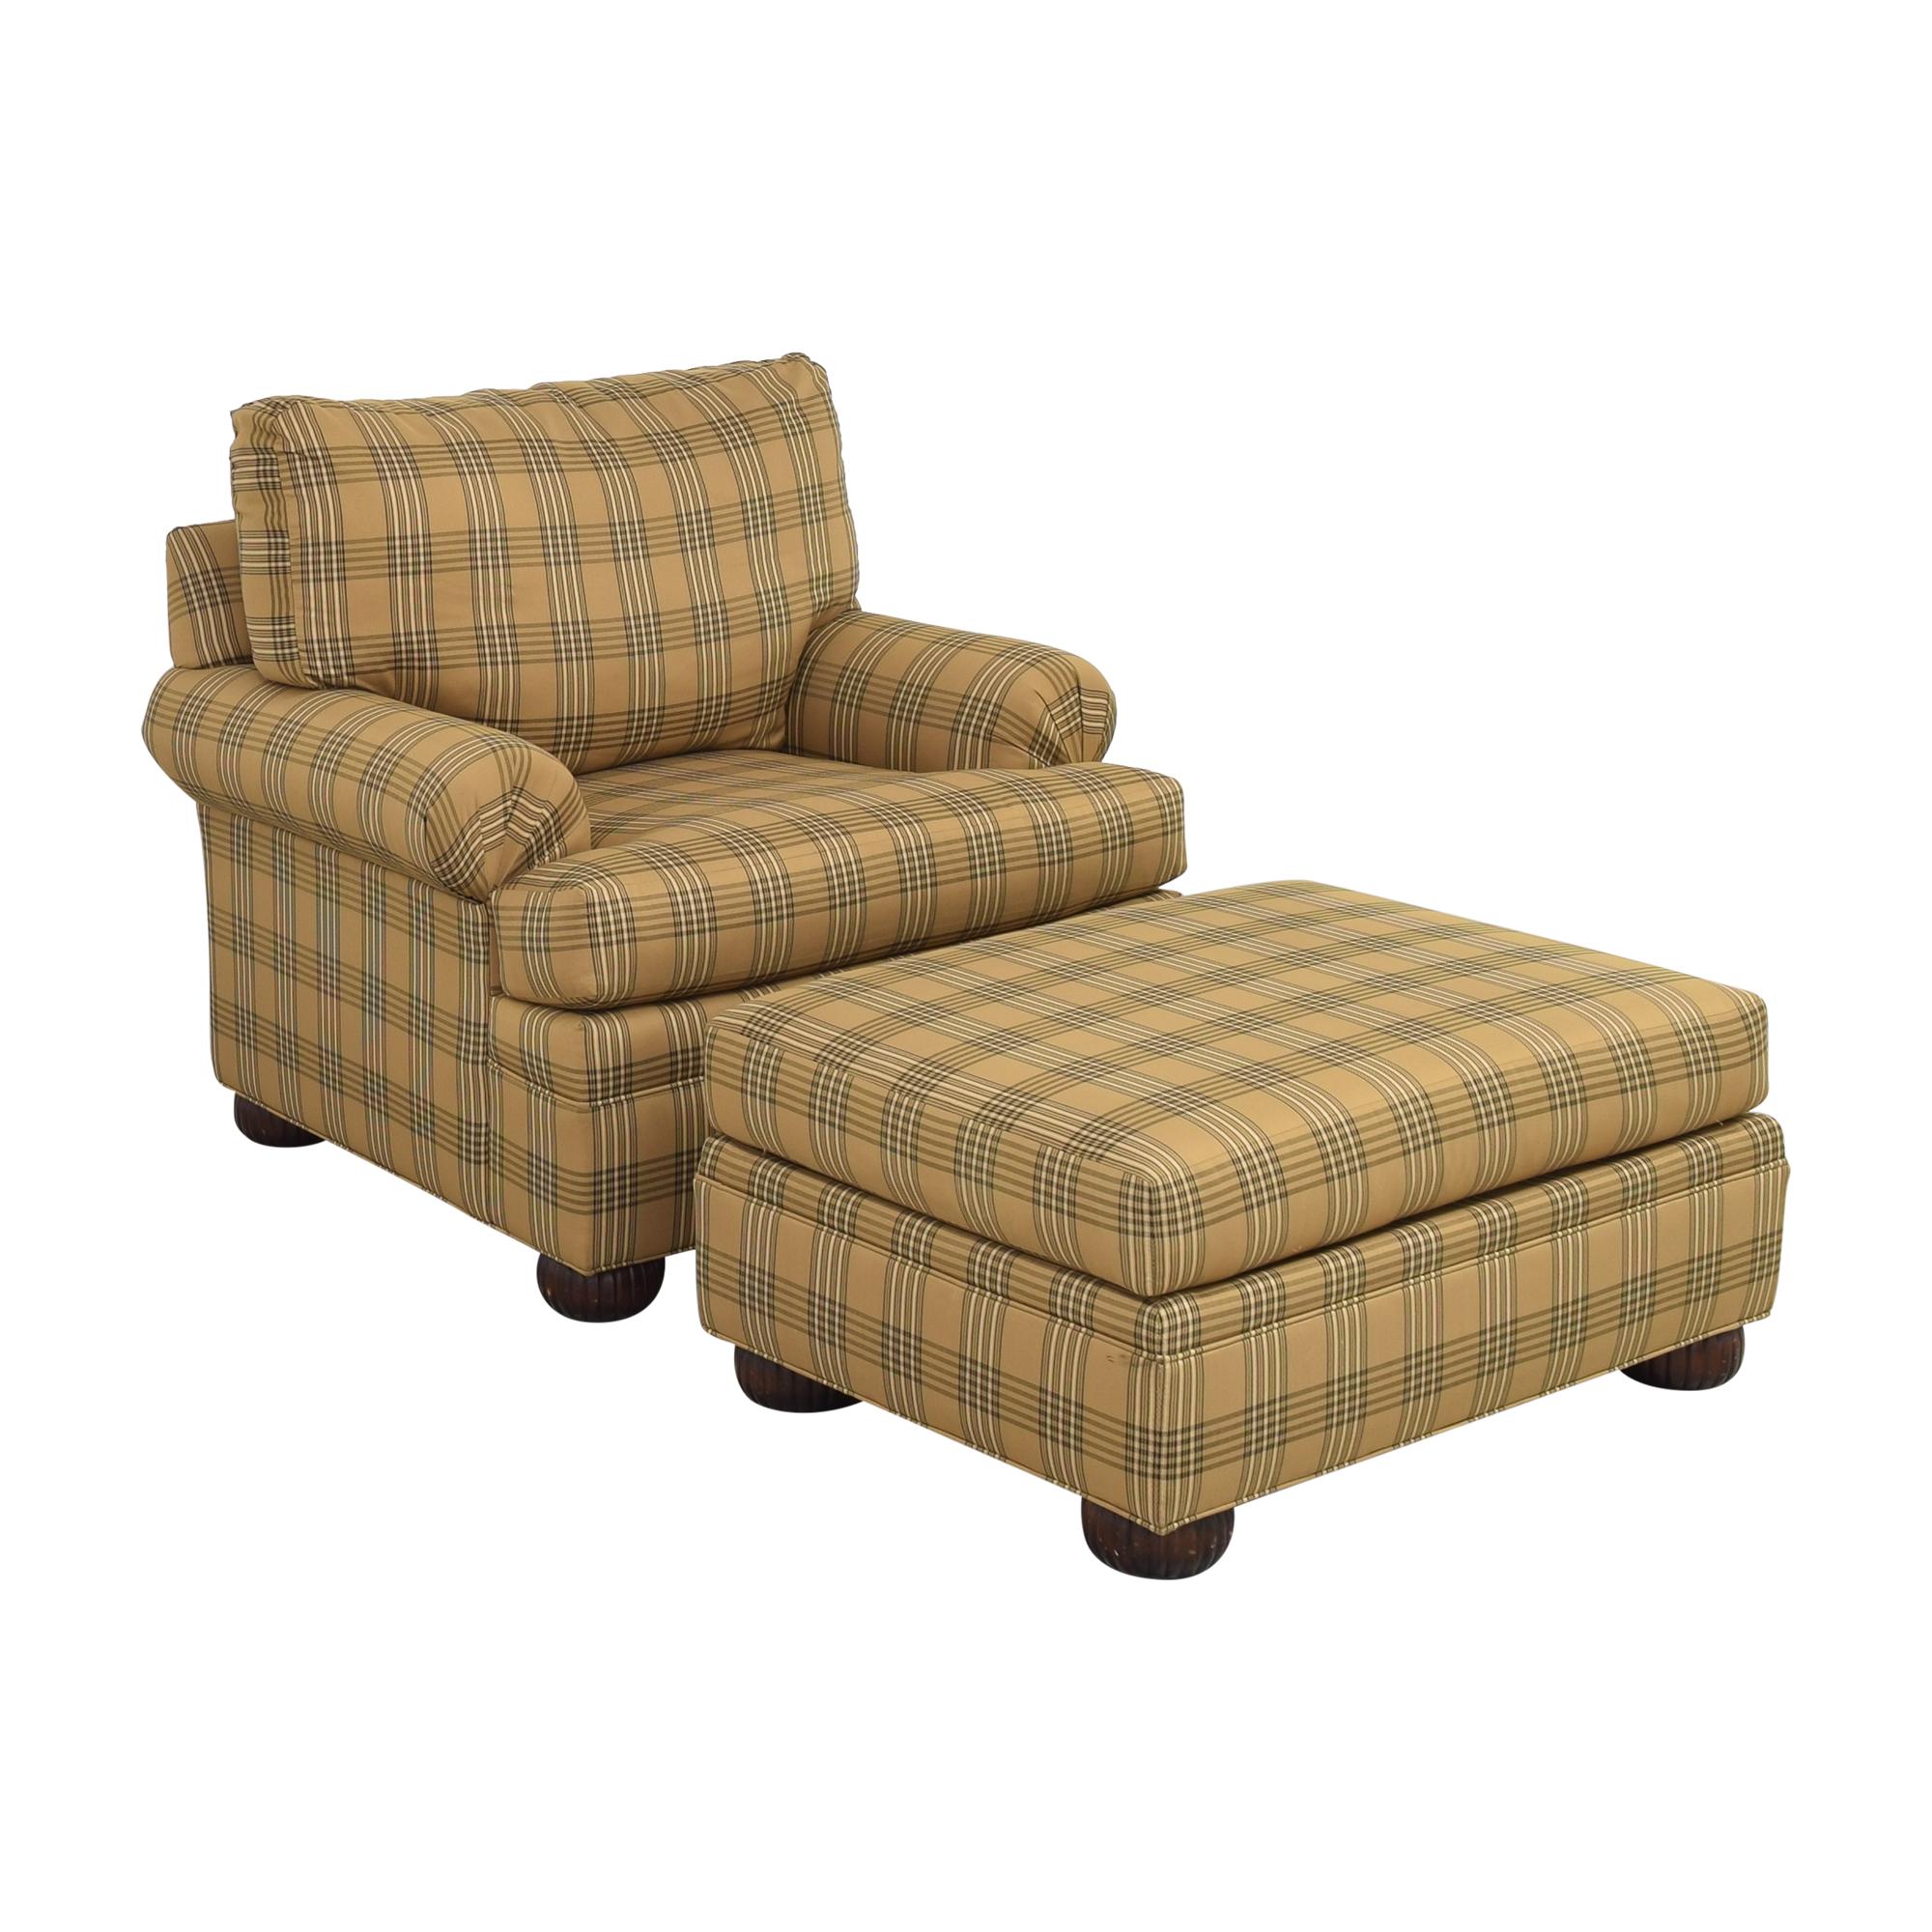 Ethan Allen Club Chair and Ottoman sale